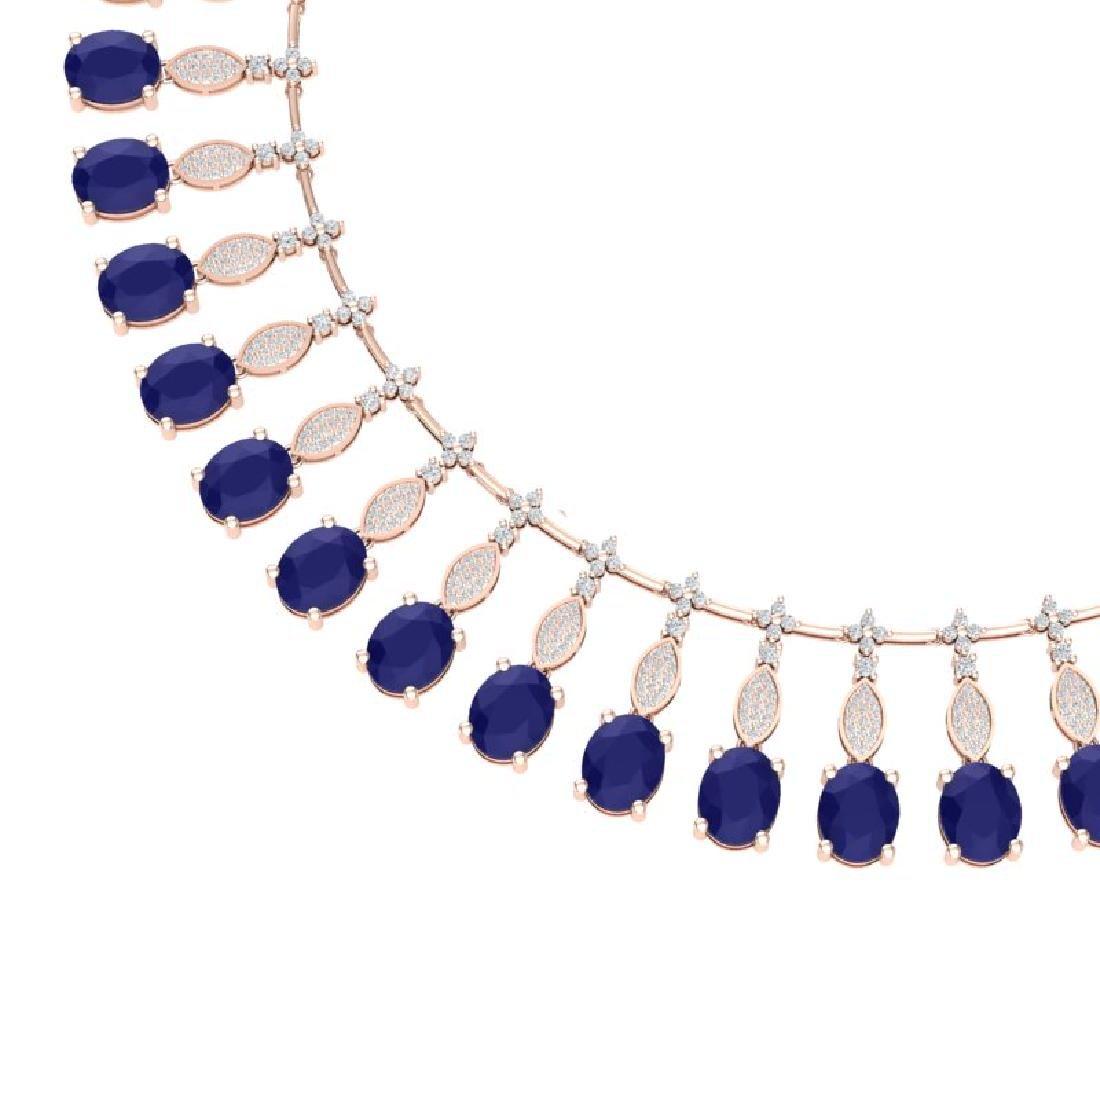 65.62 CTW Royalty Sapphire & VS Diamond Necklace 18K